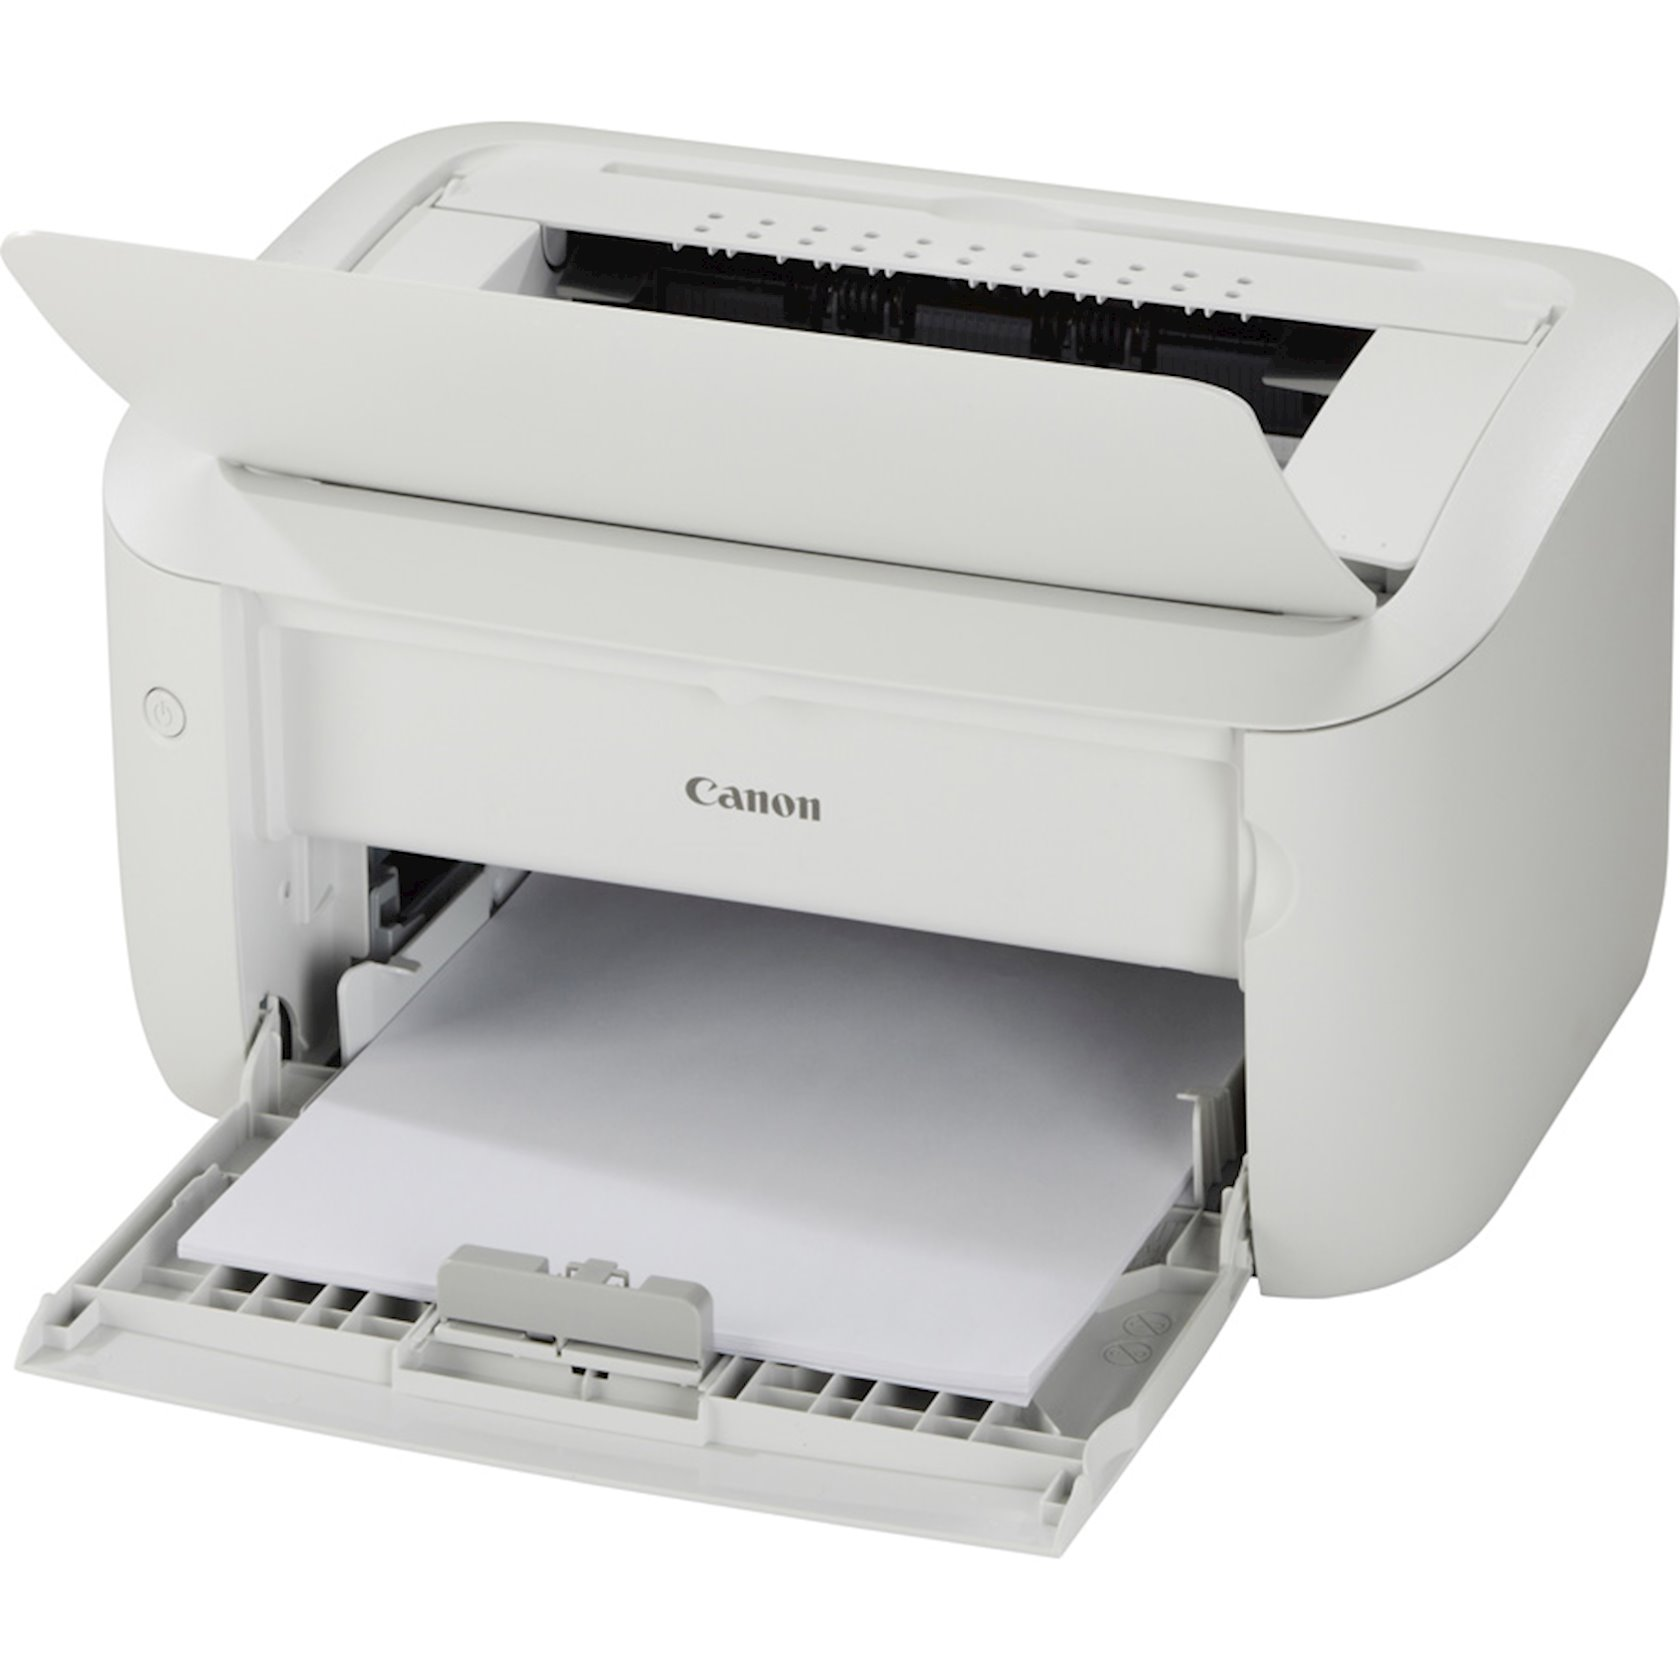 Lazer printer Canon i-SENSYS LBP6030 (8468B001)